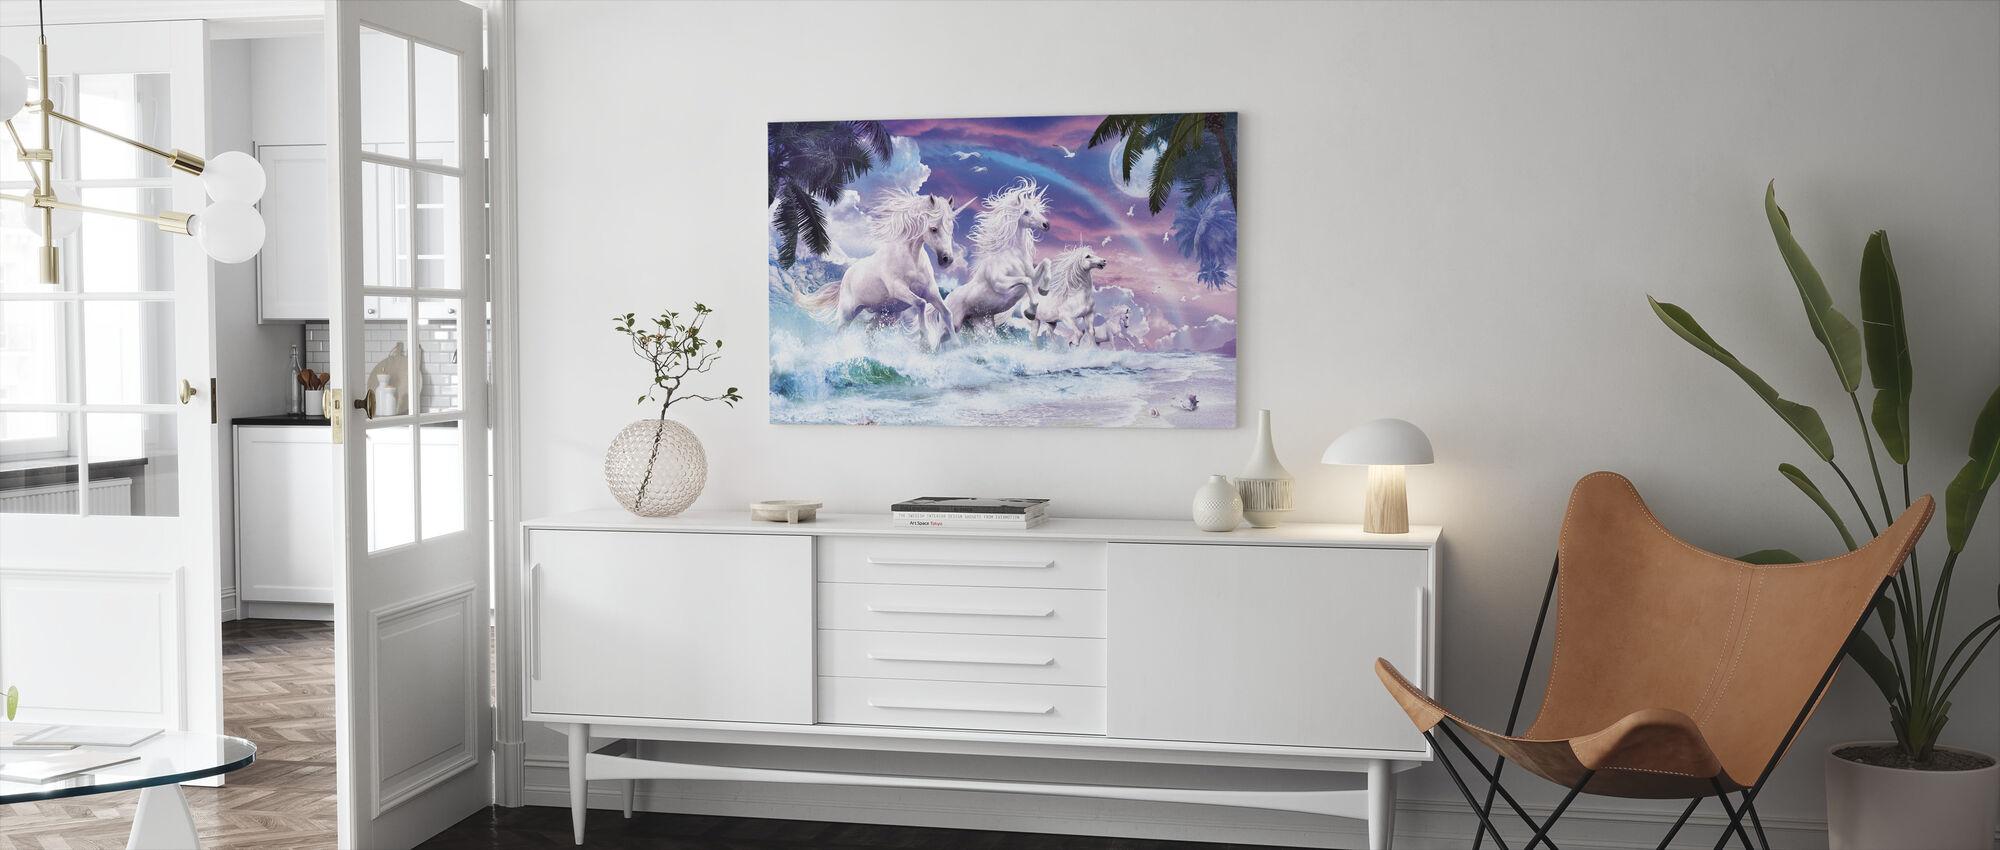 Unicorn Waves - Canvas print - Living Room